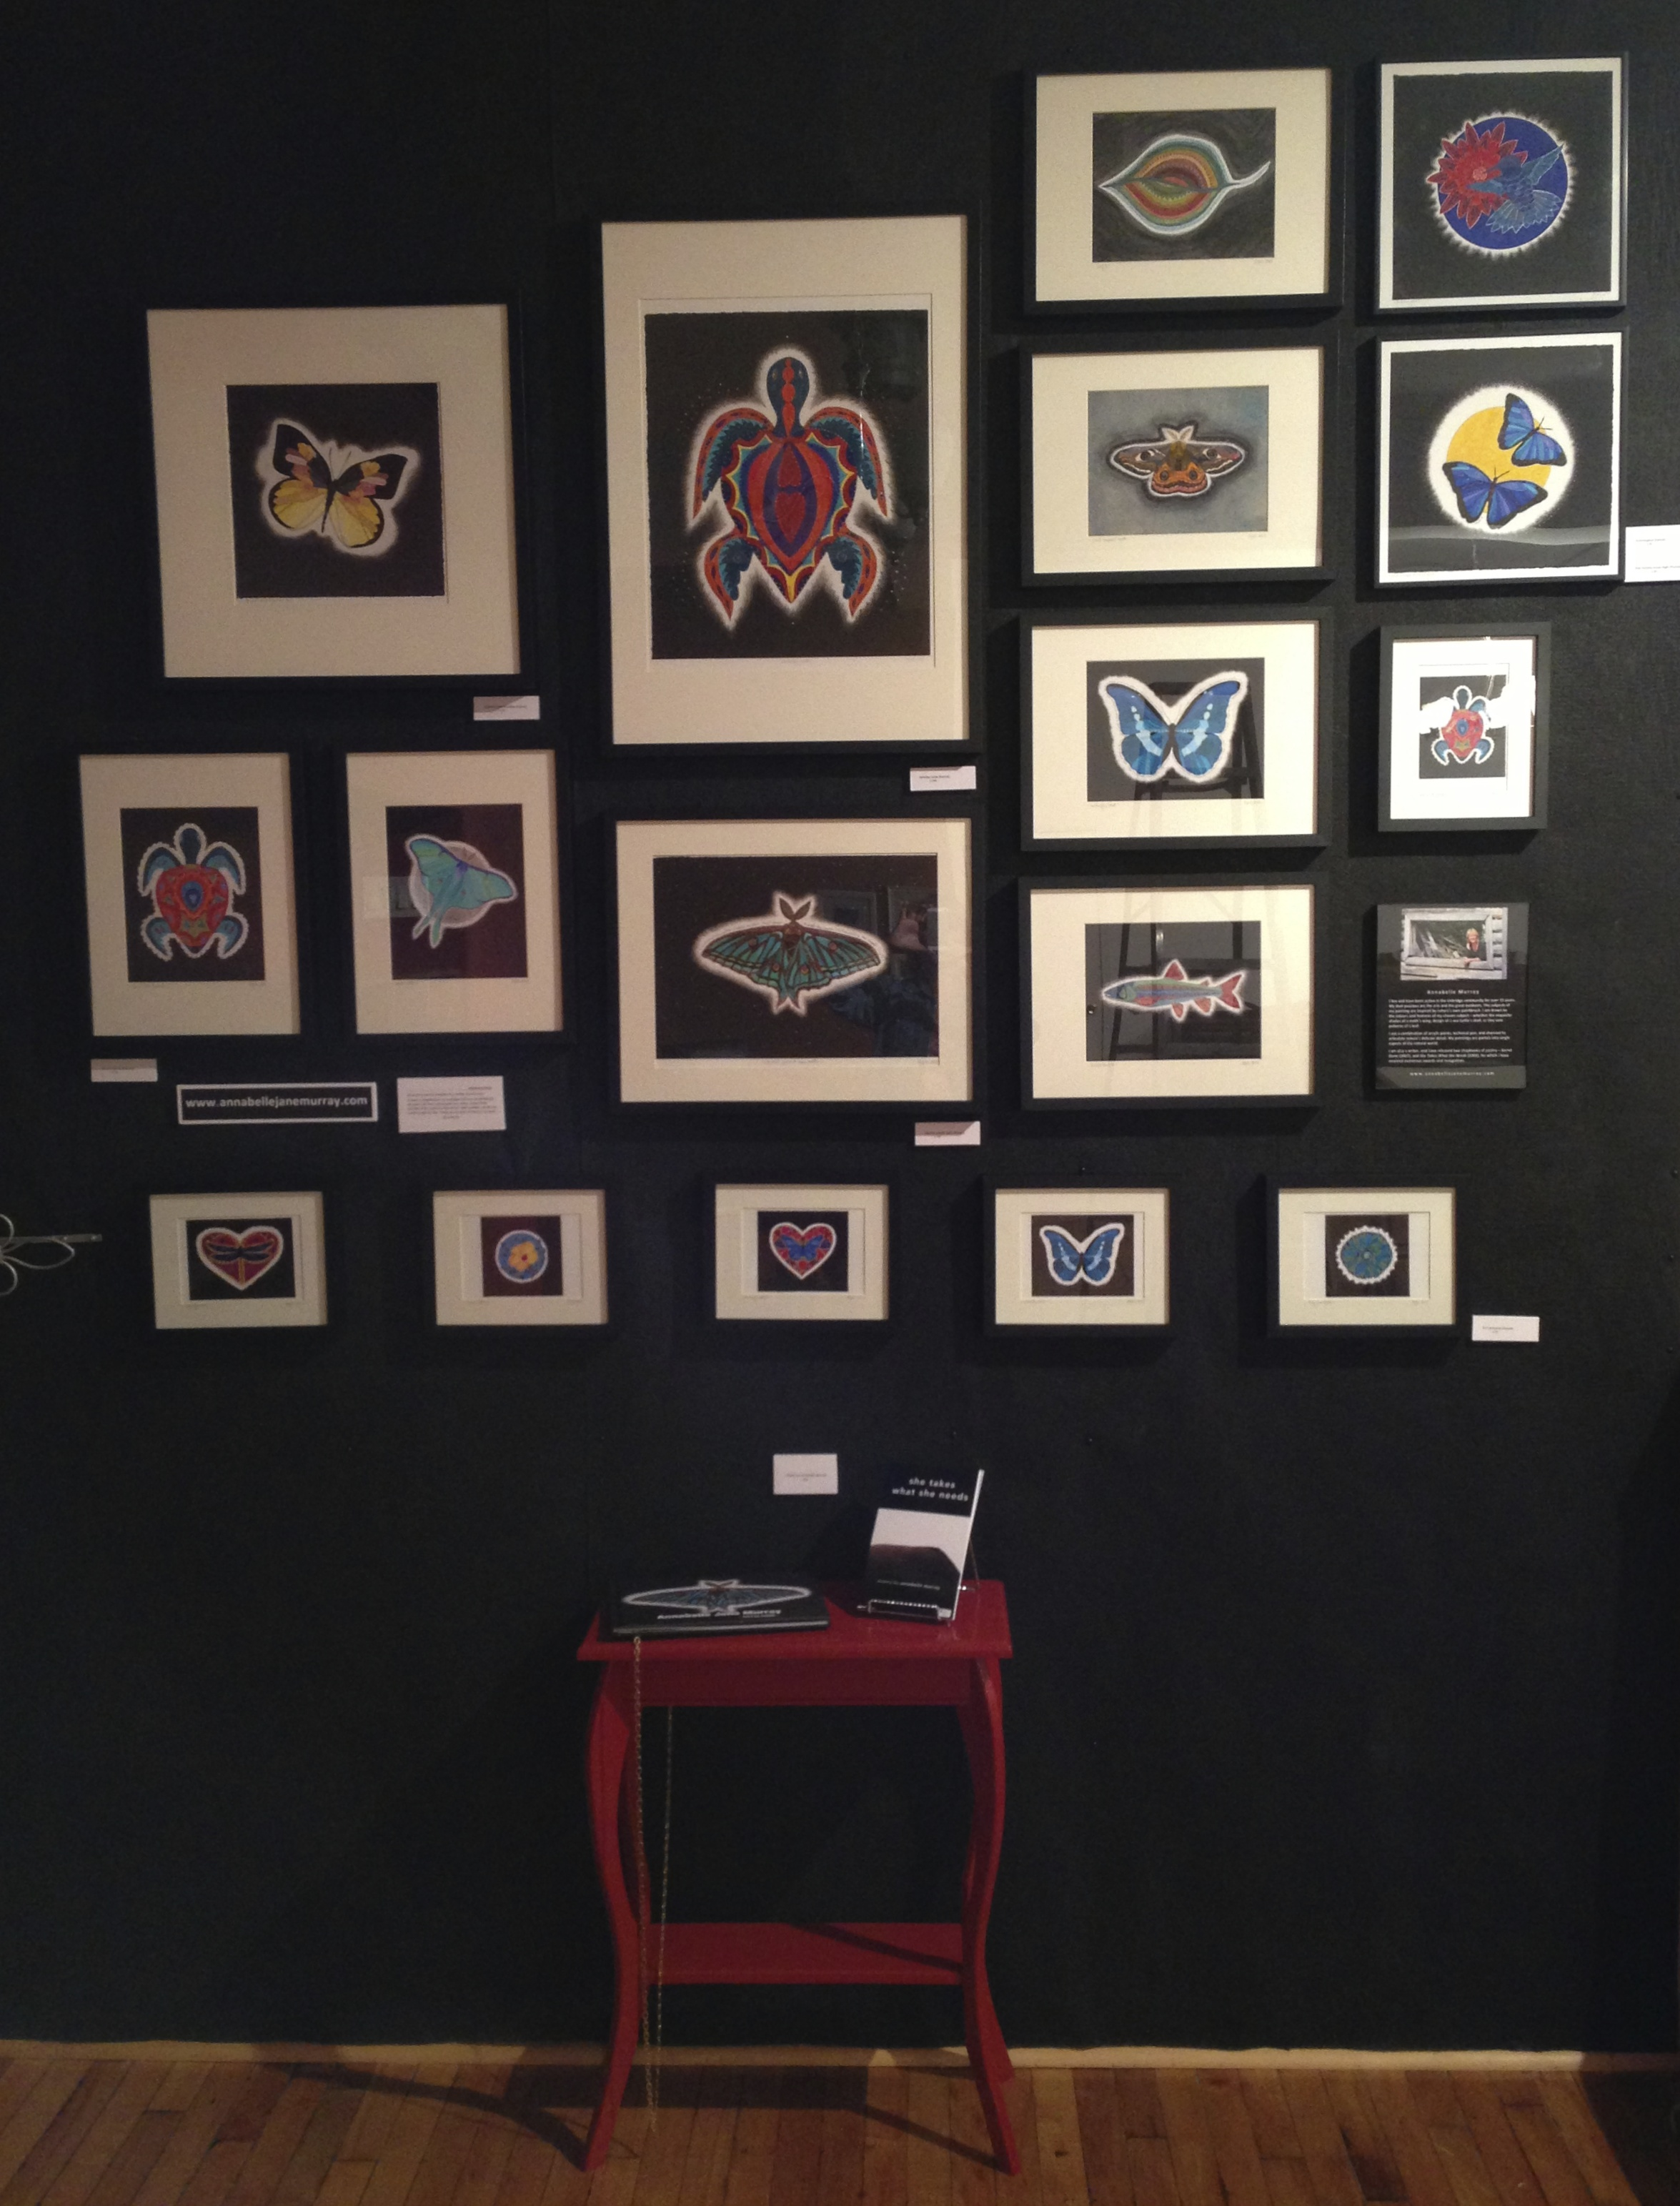 My fine art prints displayed at Blue Heron Studio Gallery, Uxbridge, ON until mid-December 2013.